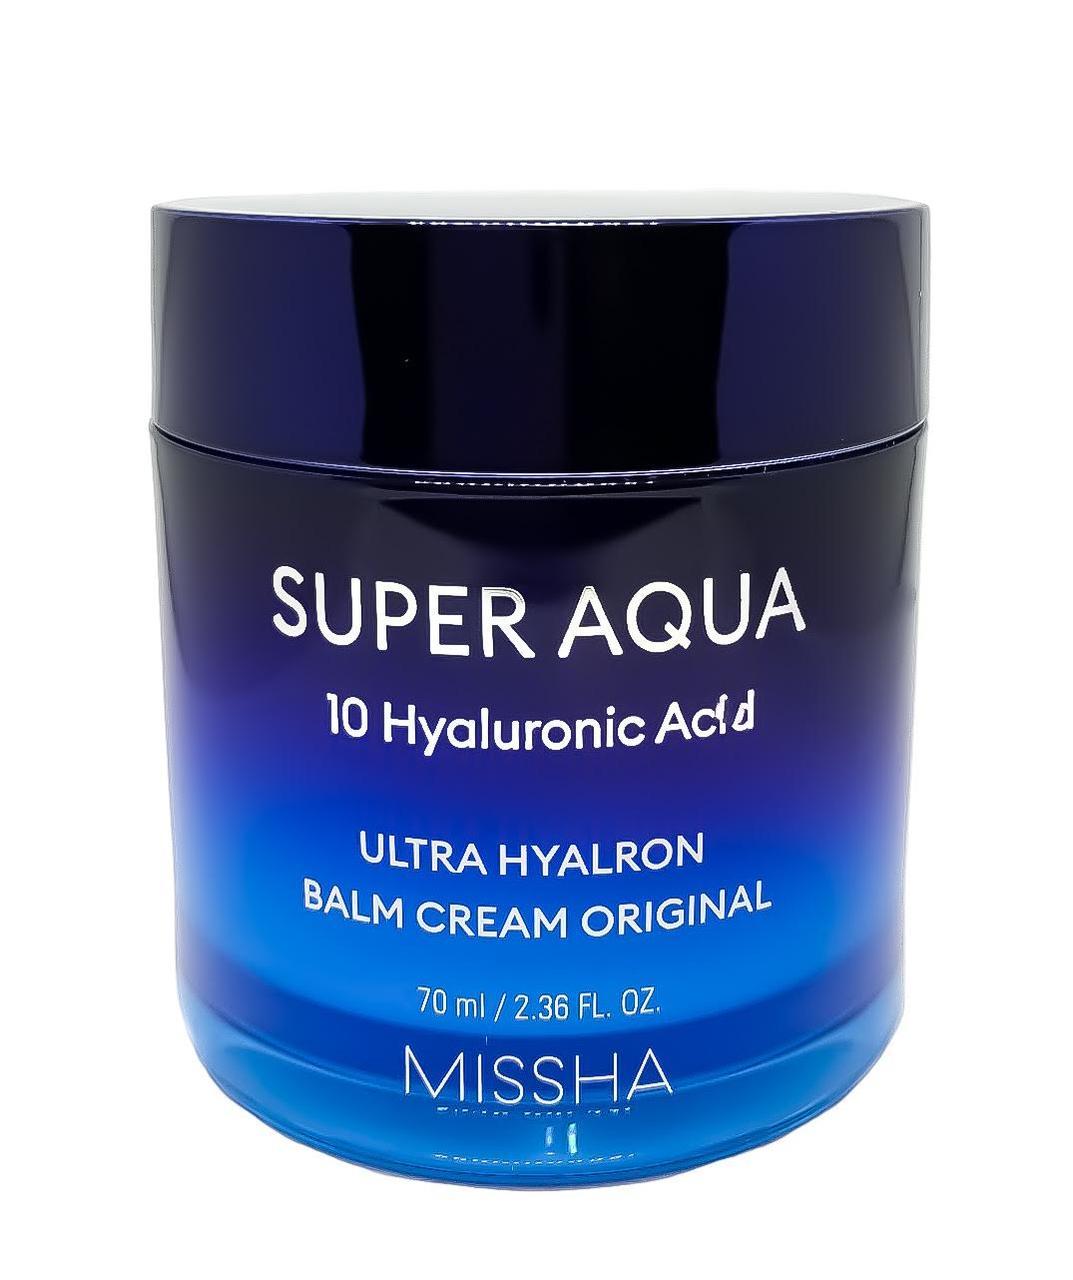 Увлажняющий крем для лица Missha Super Aqua Ultra Hyalron cream